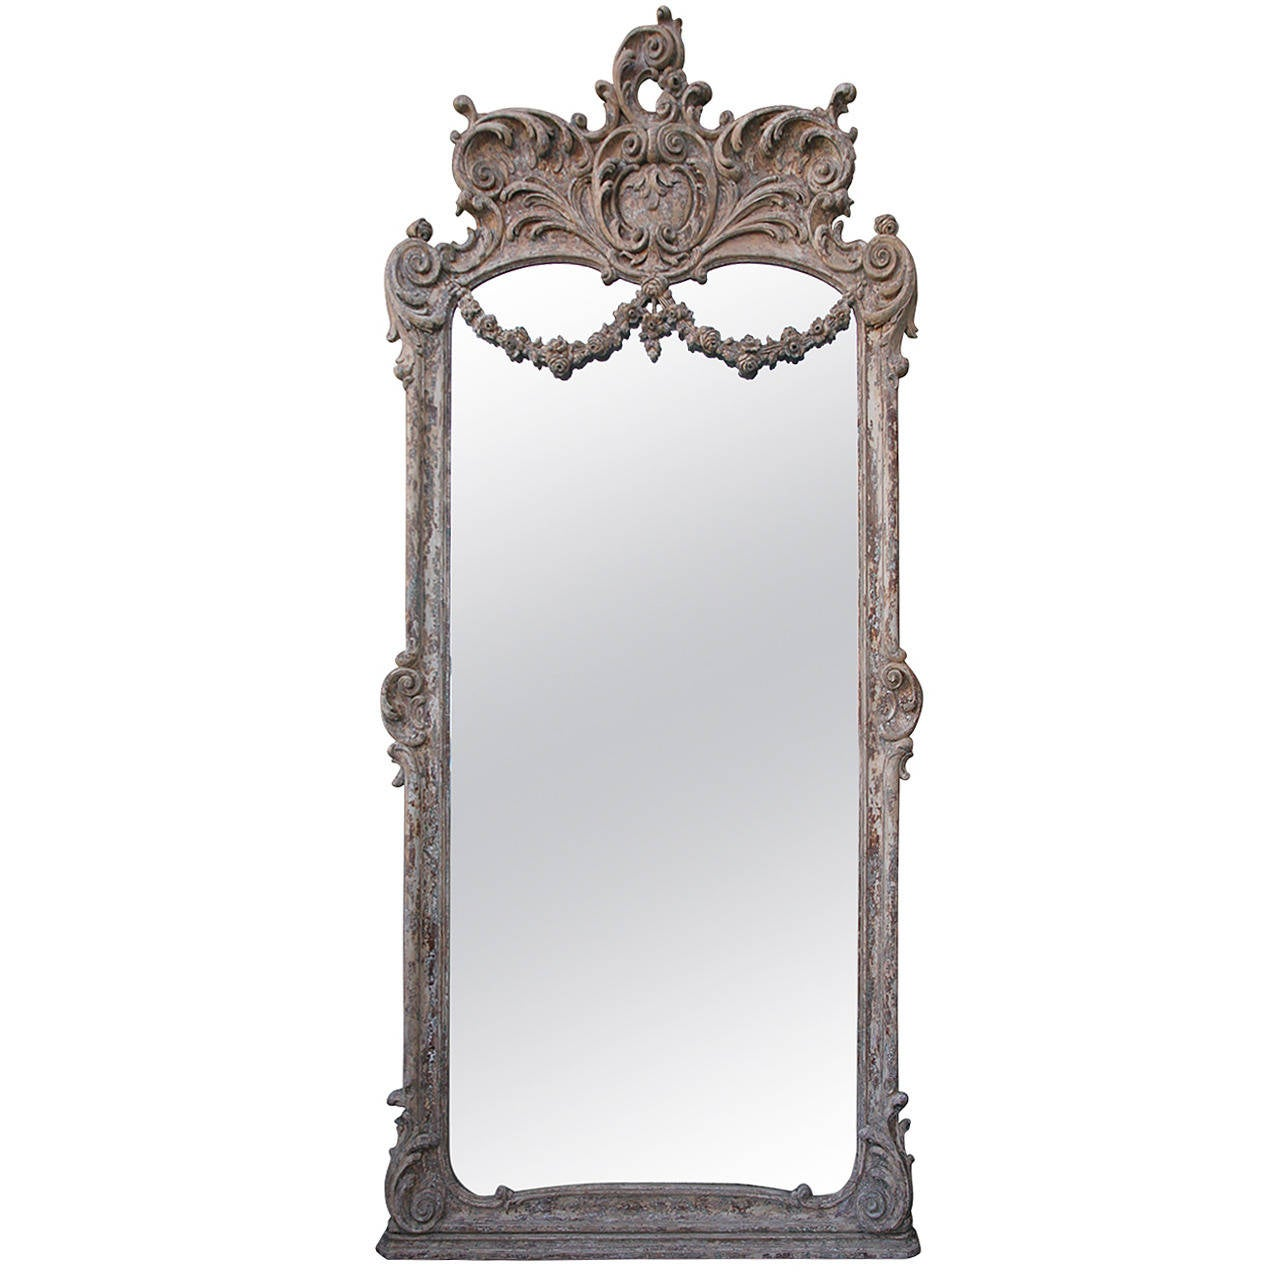 Monumental Louis XVI Style Painted Mirror